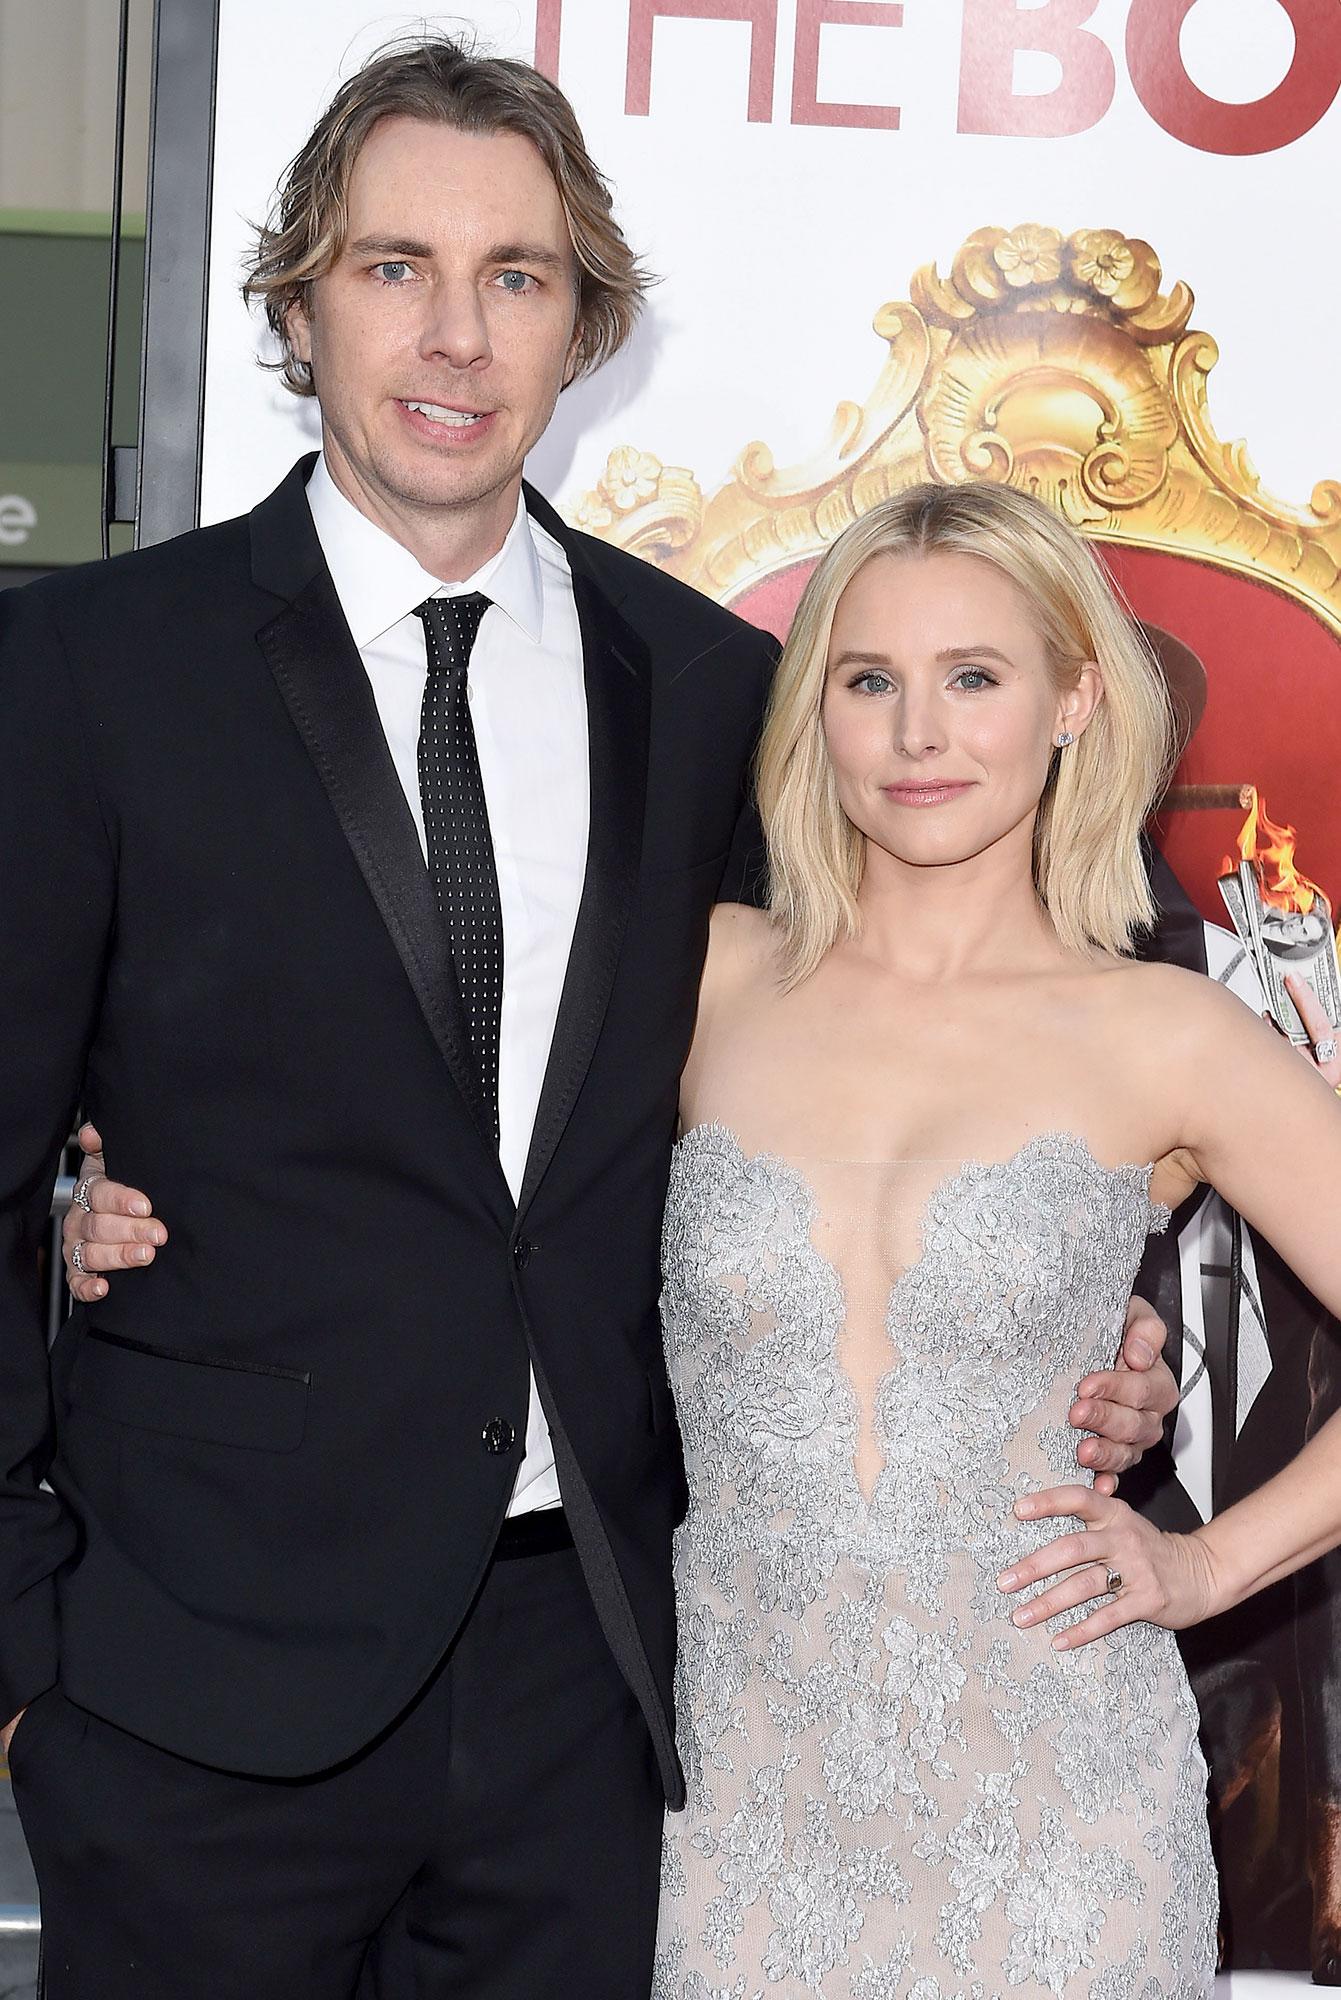 Kristen Bell Gets Emotional Talking About Husband Dax Shepard's Addict Past